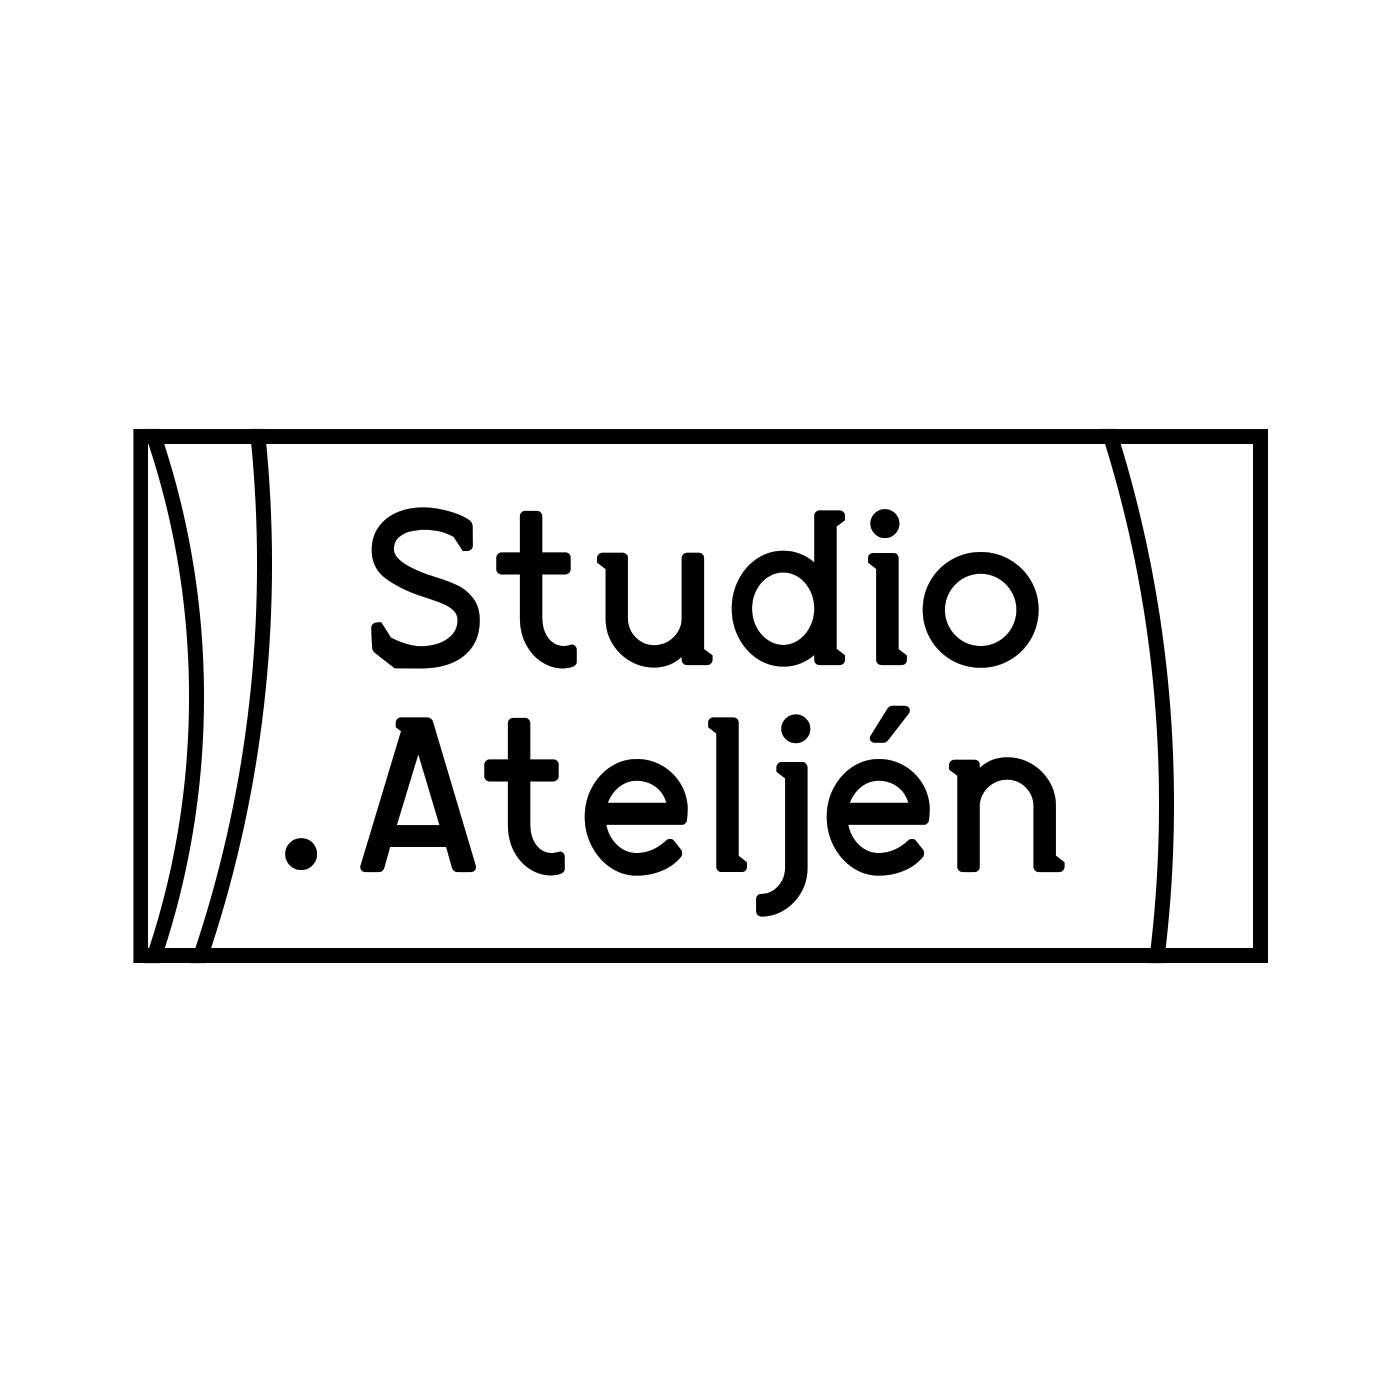 Studio Ateljén